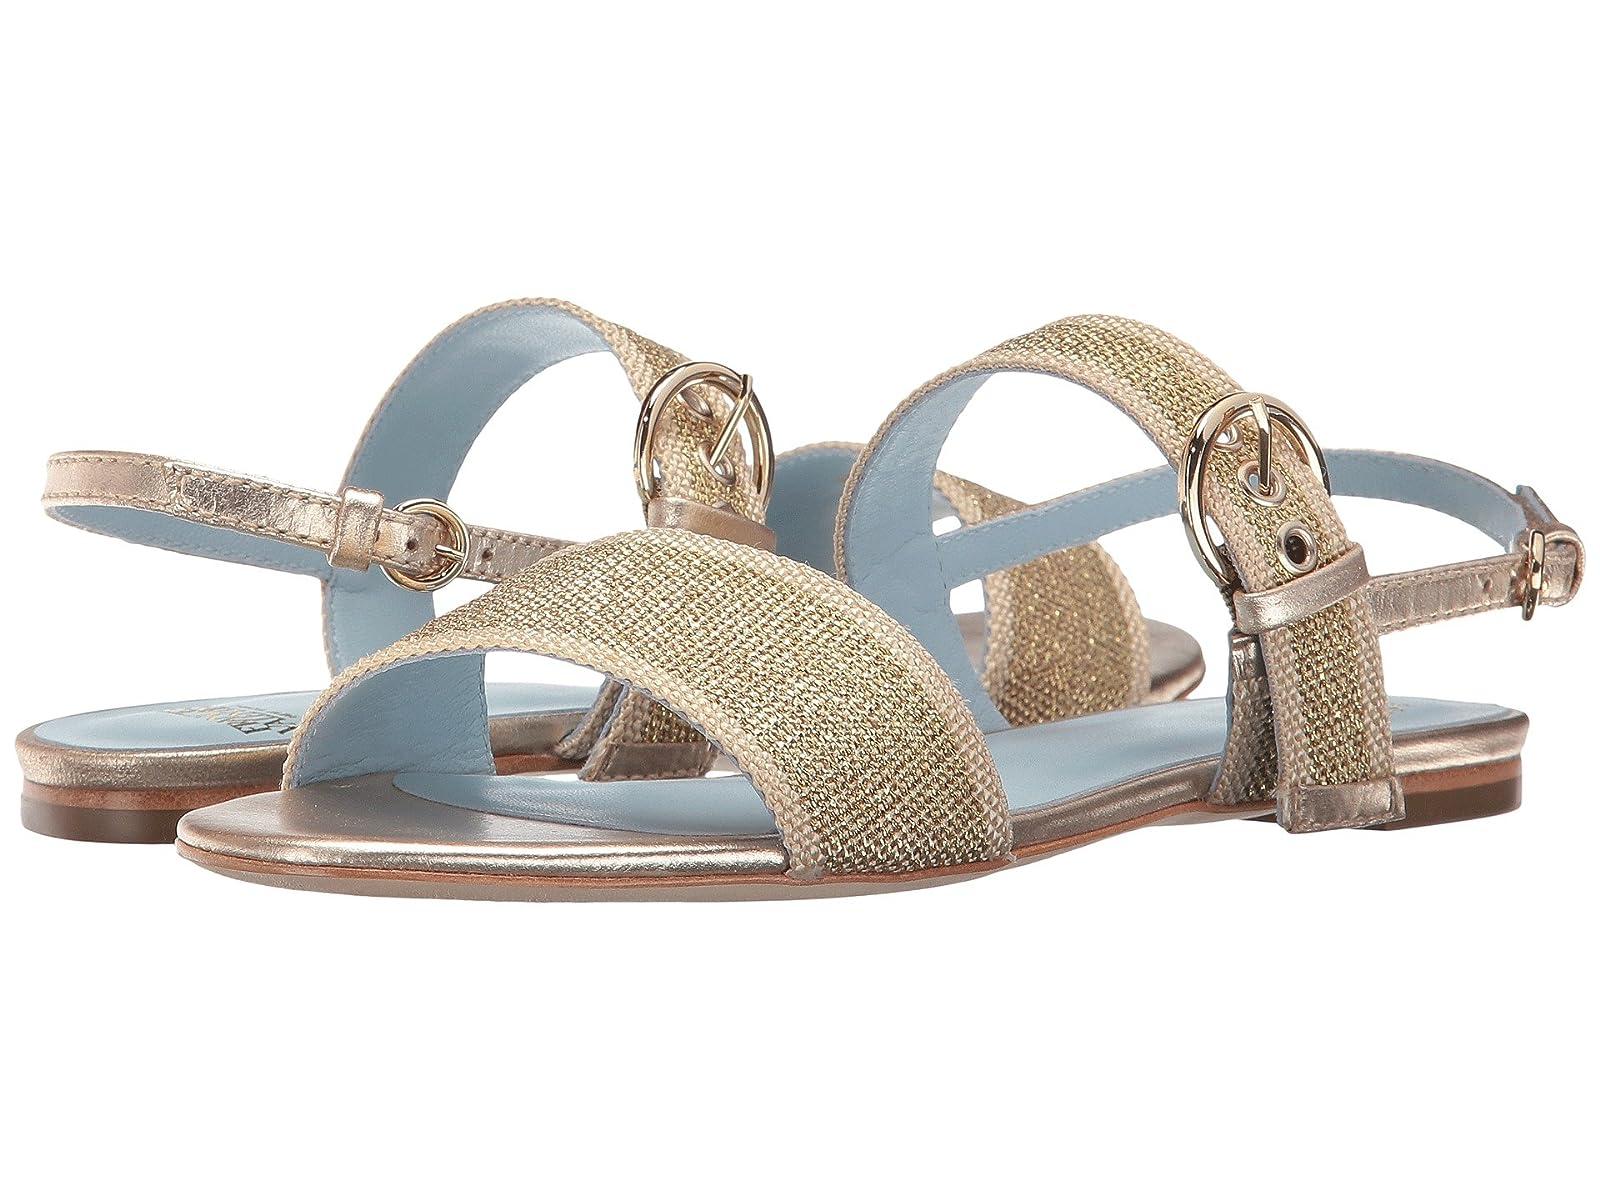 Frances Valentine FaithCheap and distinctive eye-catching shoes